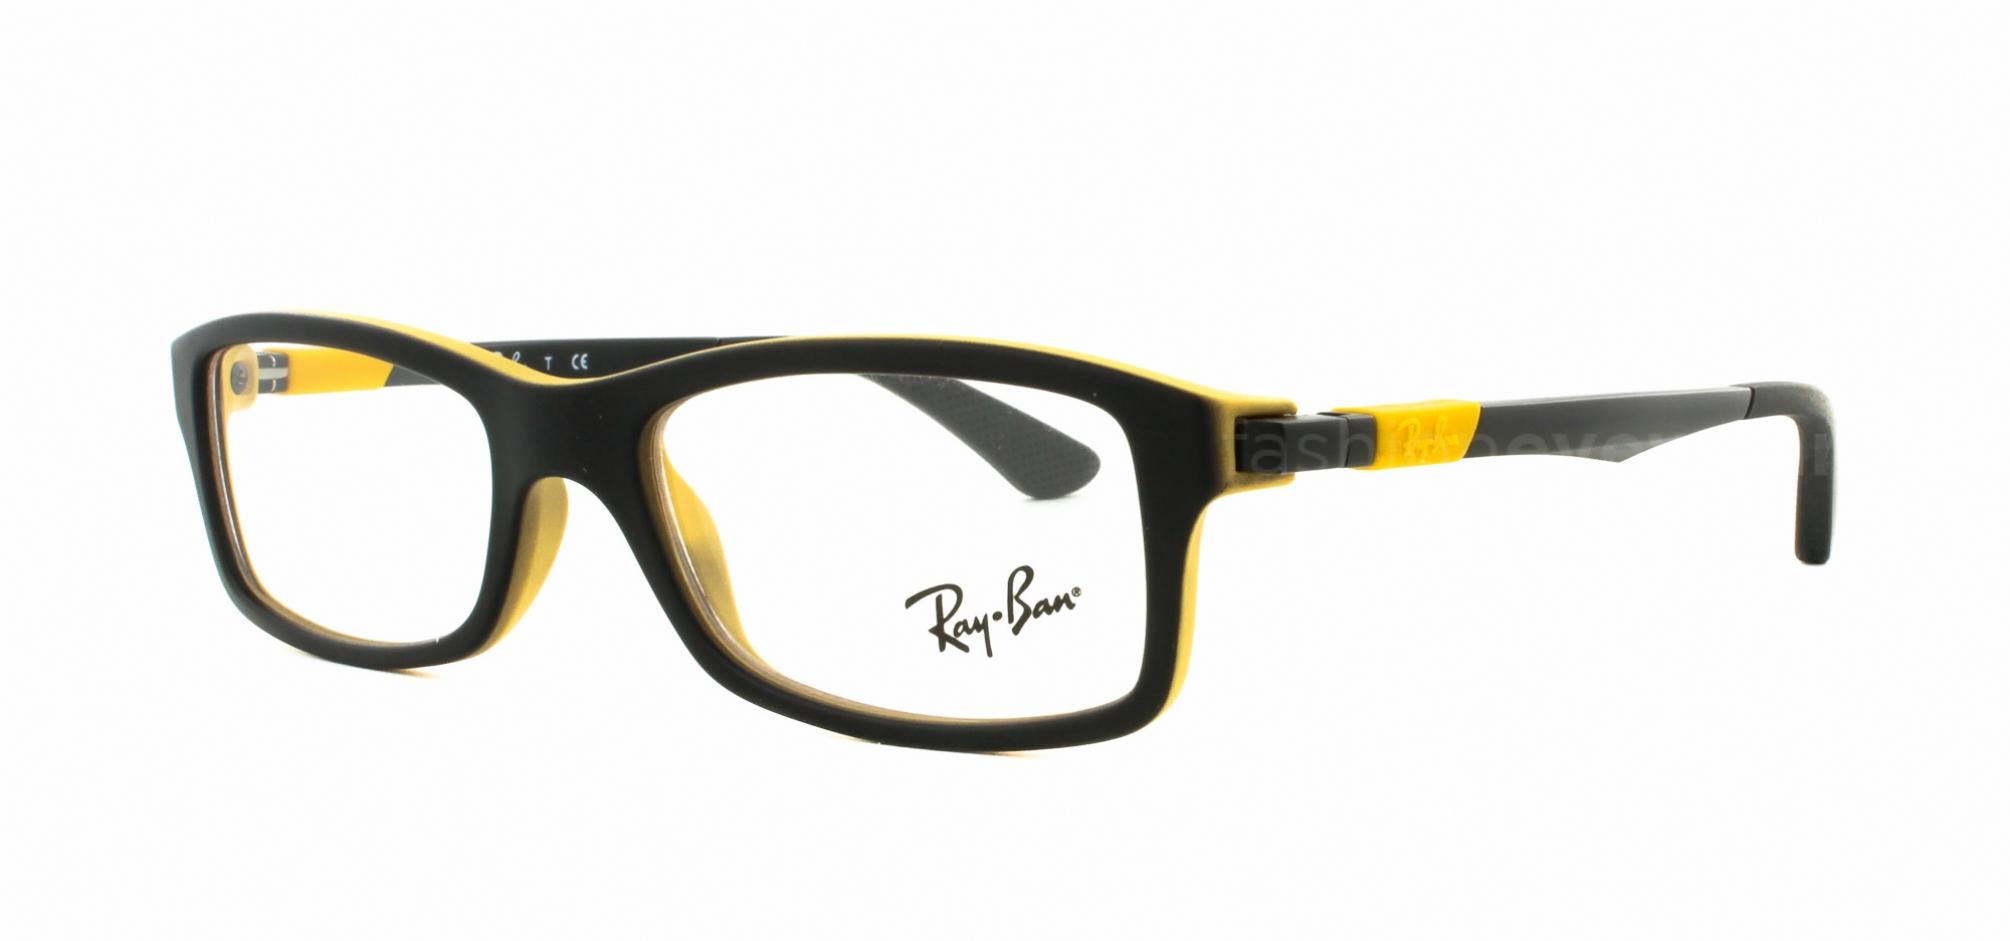 cd4d7732c6 Ray Ban Jr Eyeglasses « Heritage Malta